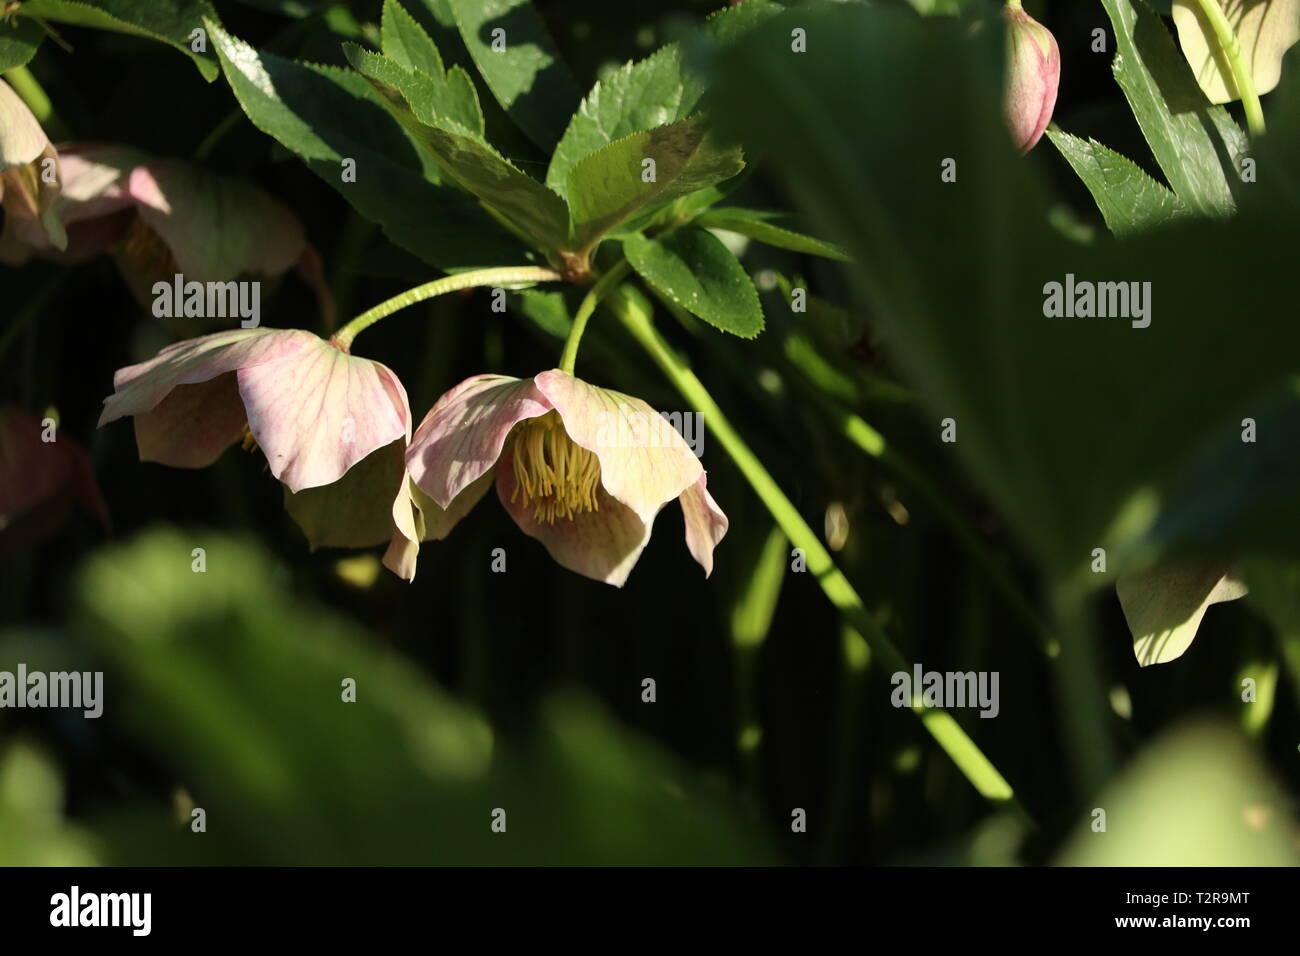 christ rose blossom - Stock Image